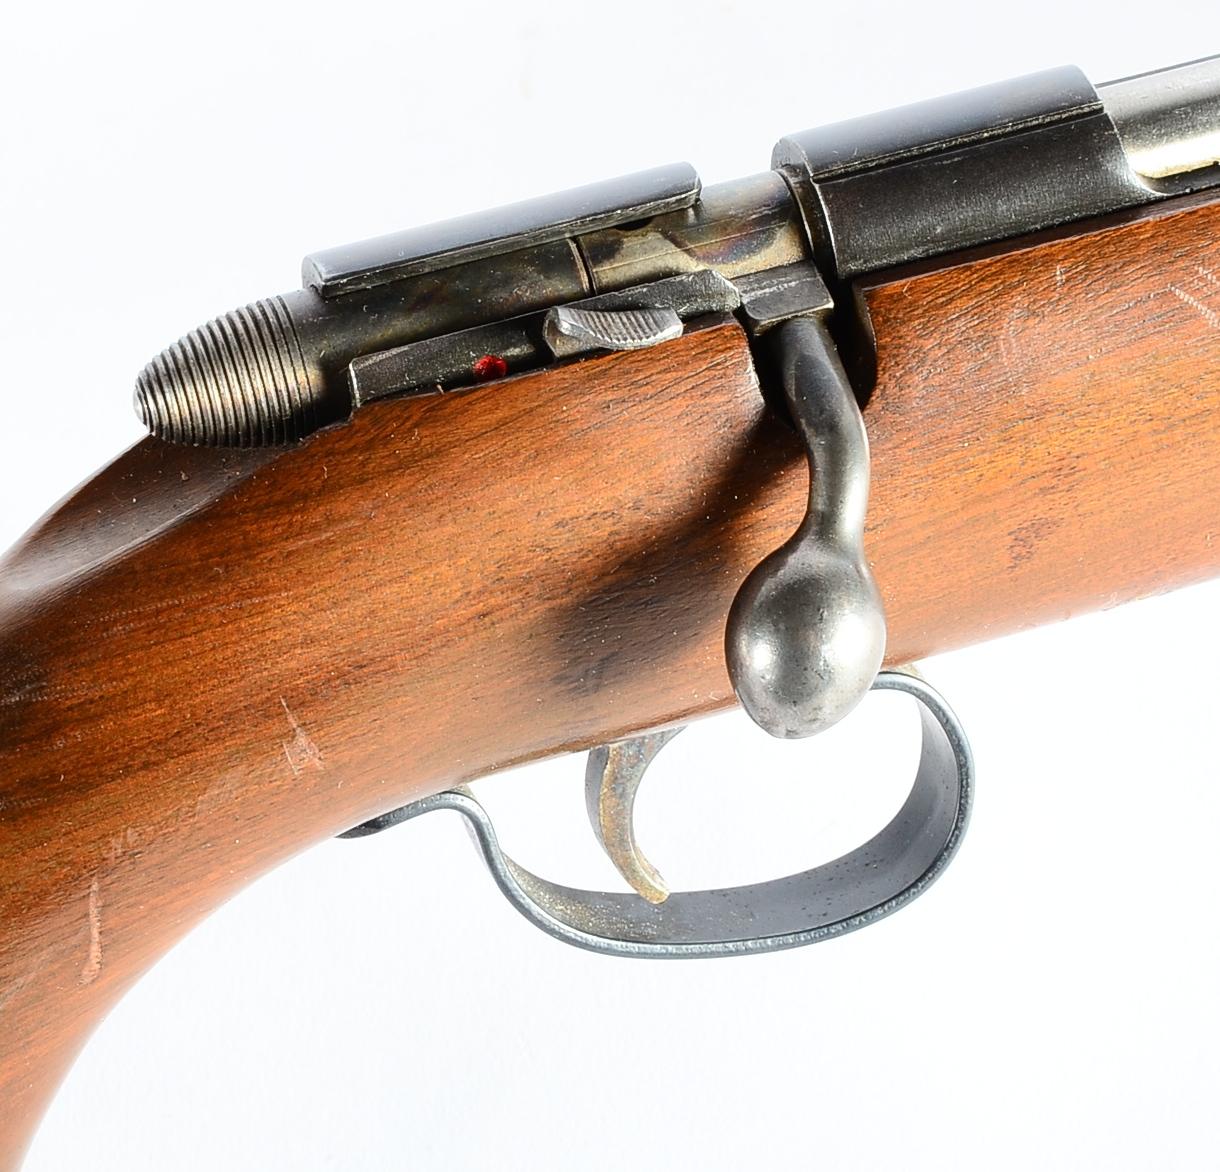 Remington model 41 targetmaster